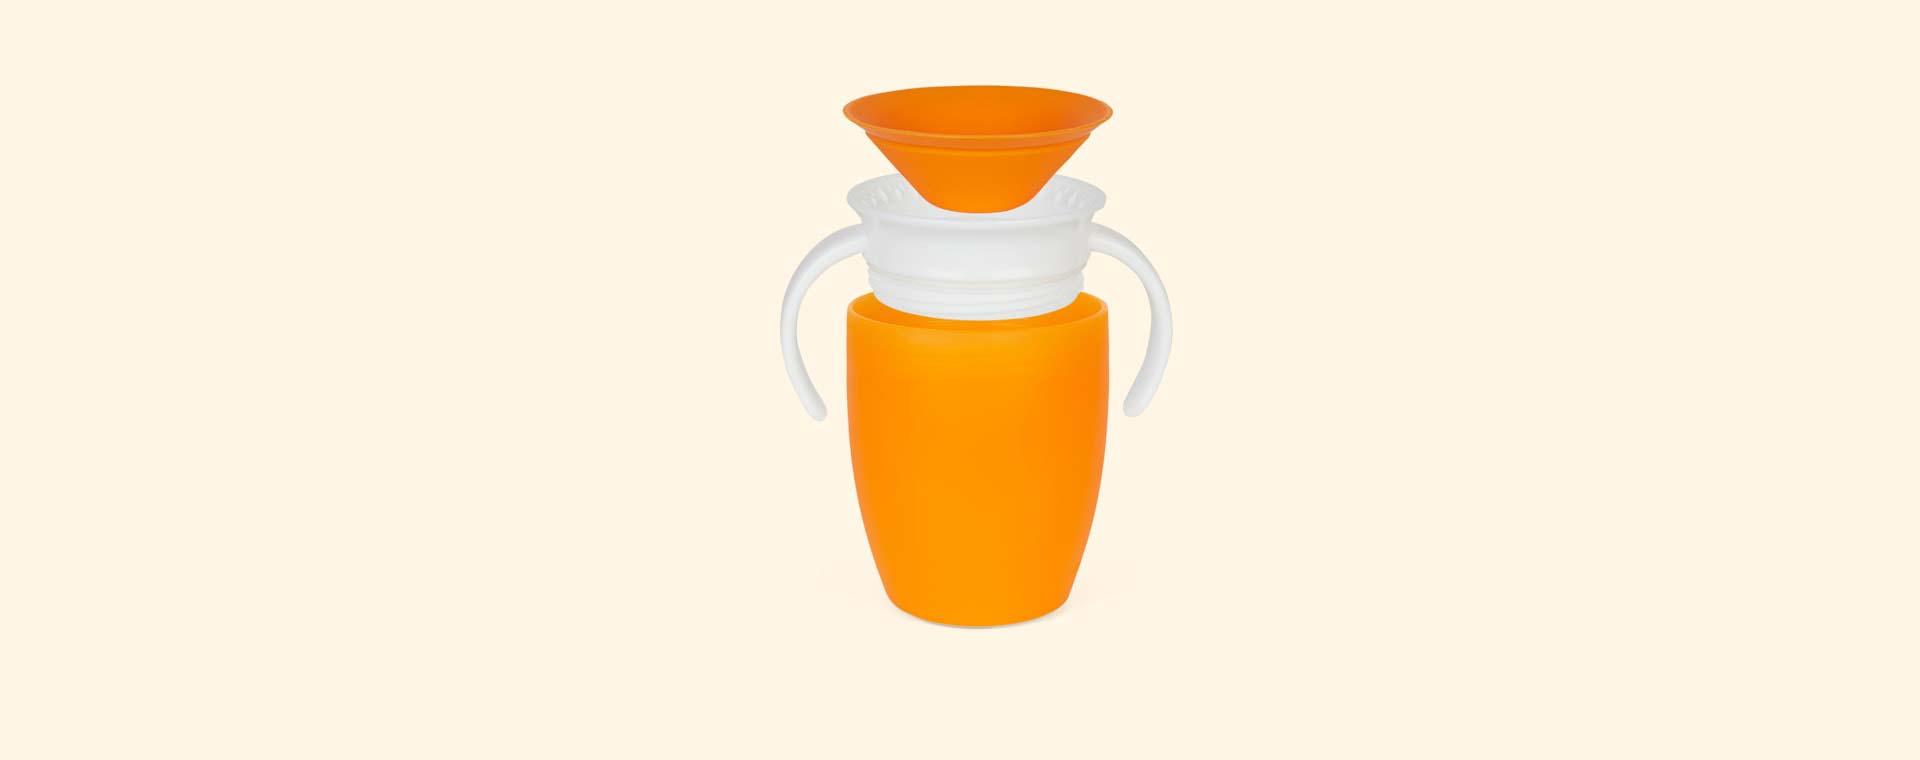 Orange Munchkin Miracle Training Cup